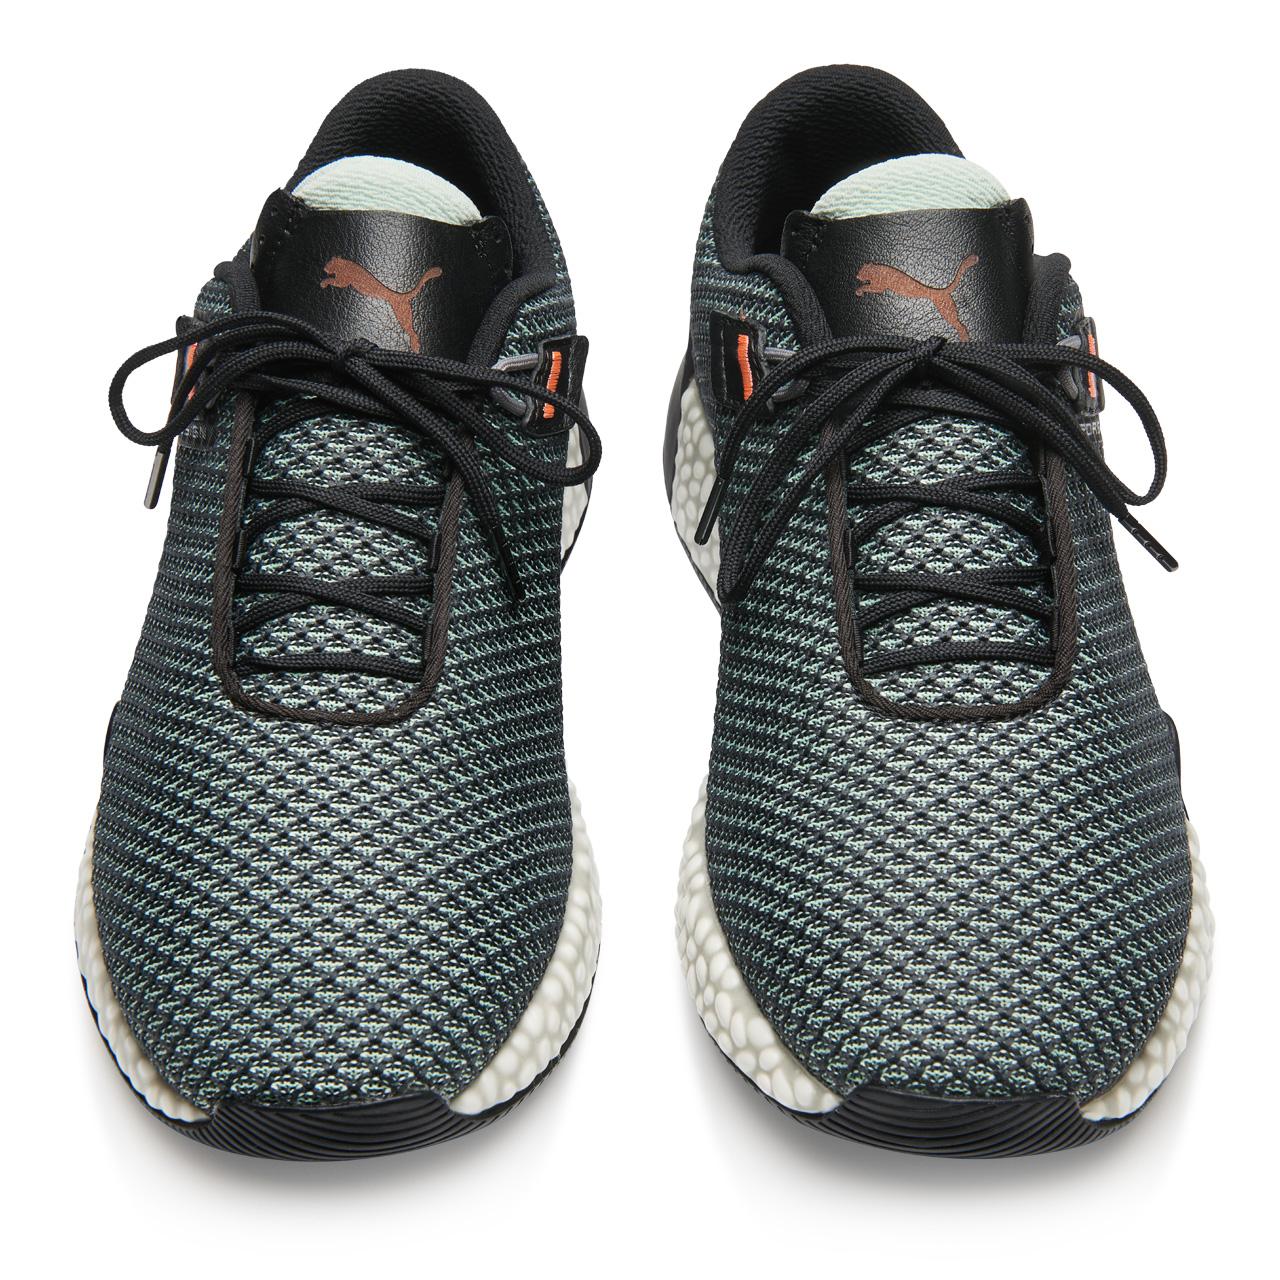 Hybrid Tourer Running Shoes - Sports